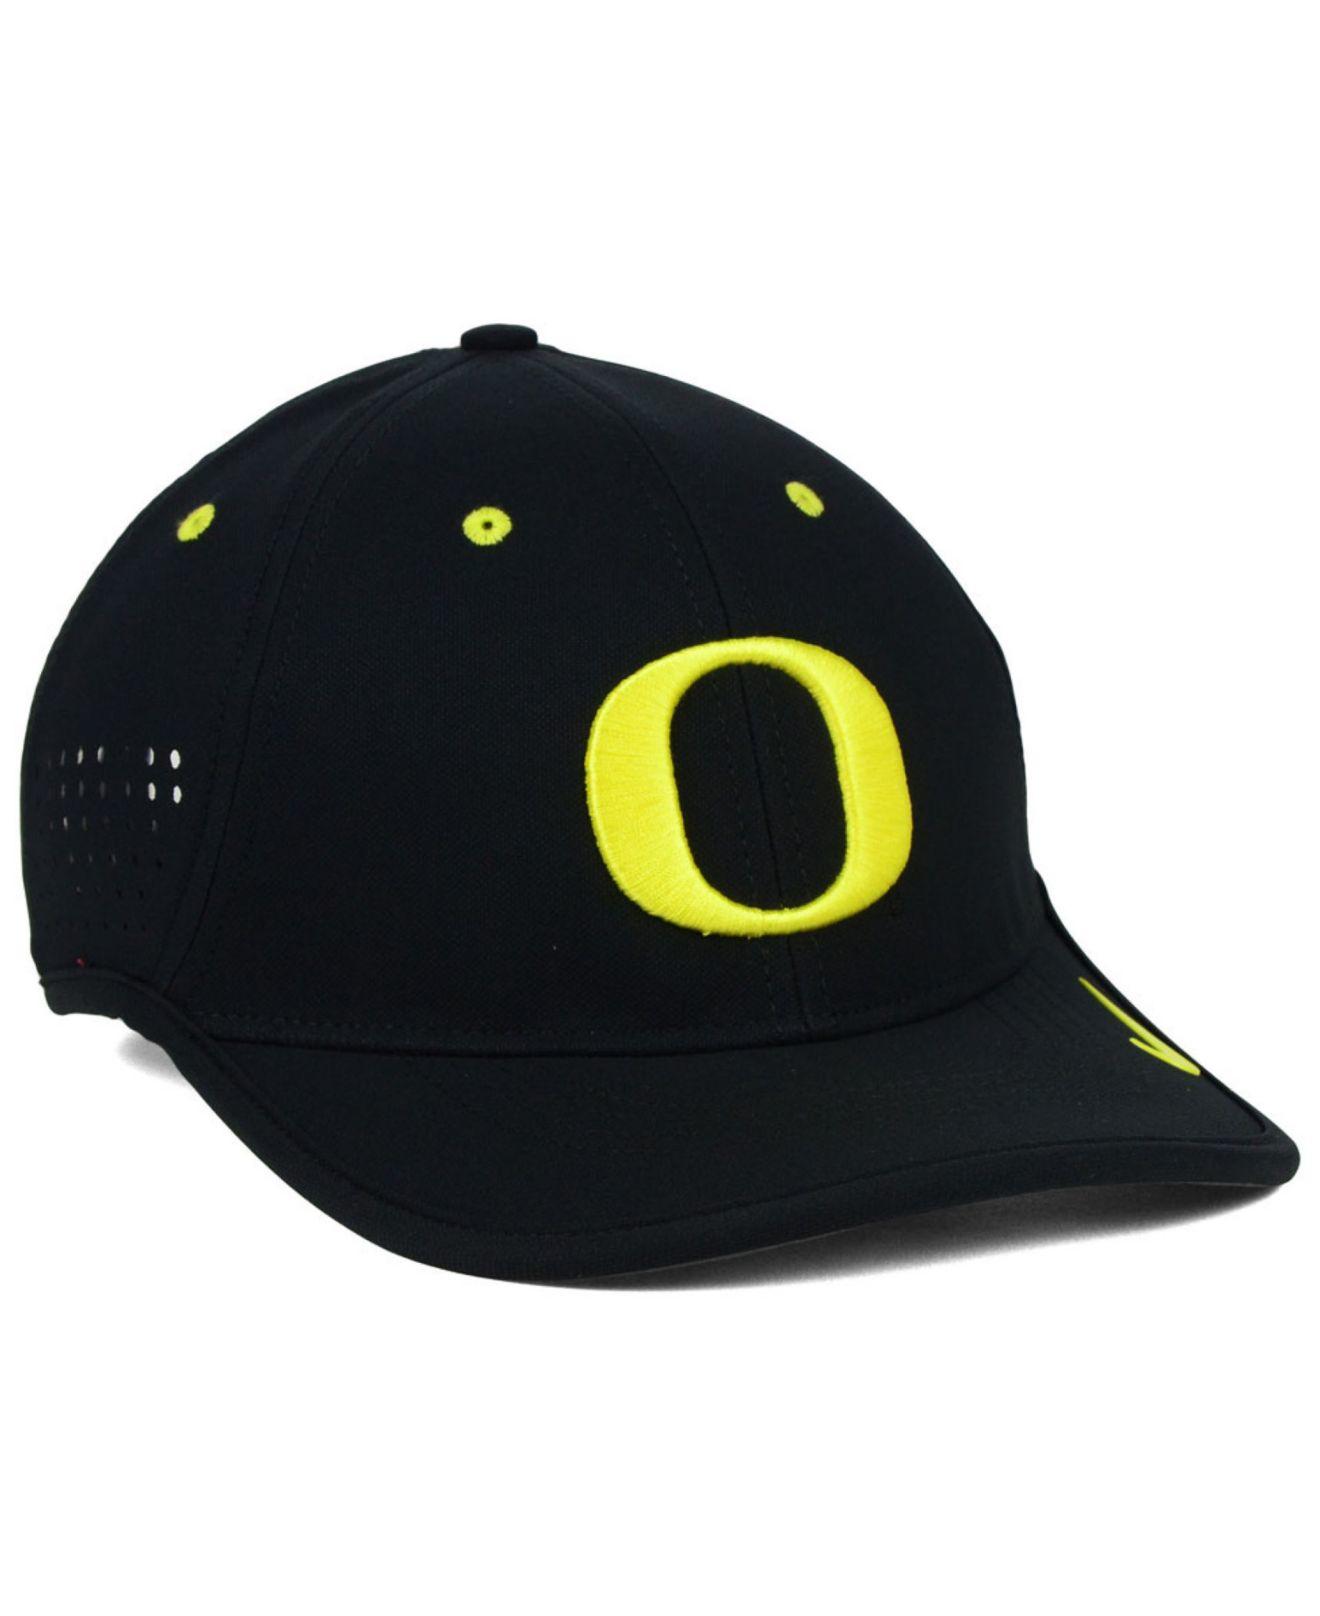 4ade13596533d ... wholesale lyst nike oregon ducks dri fit coaches cap in black for men  b8bf9 d2e86